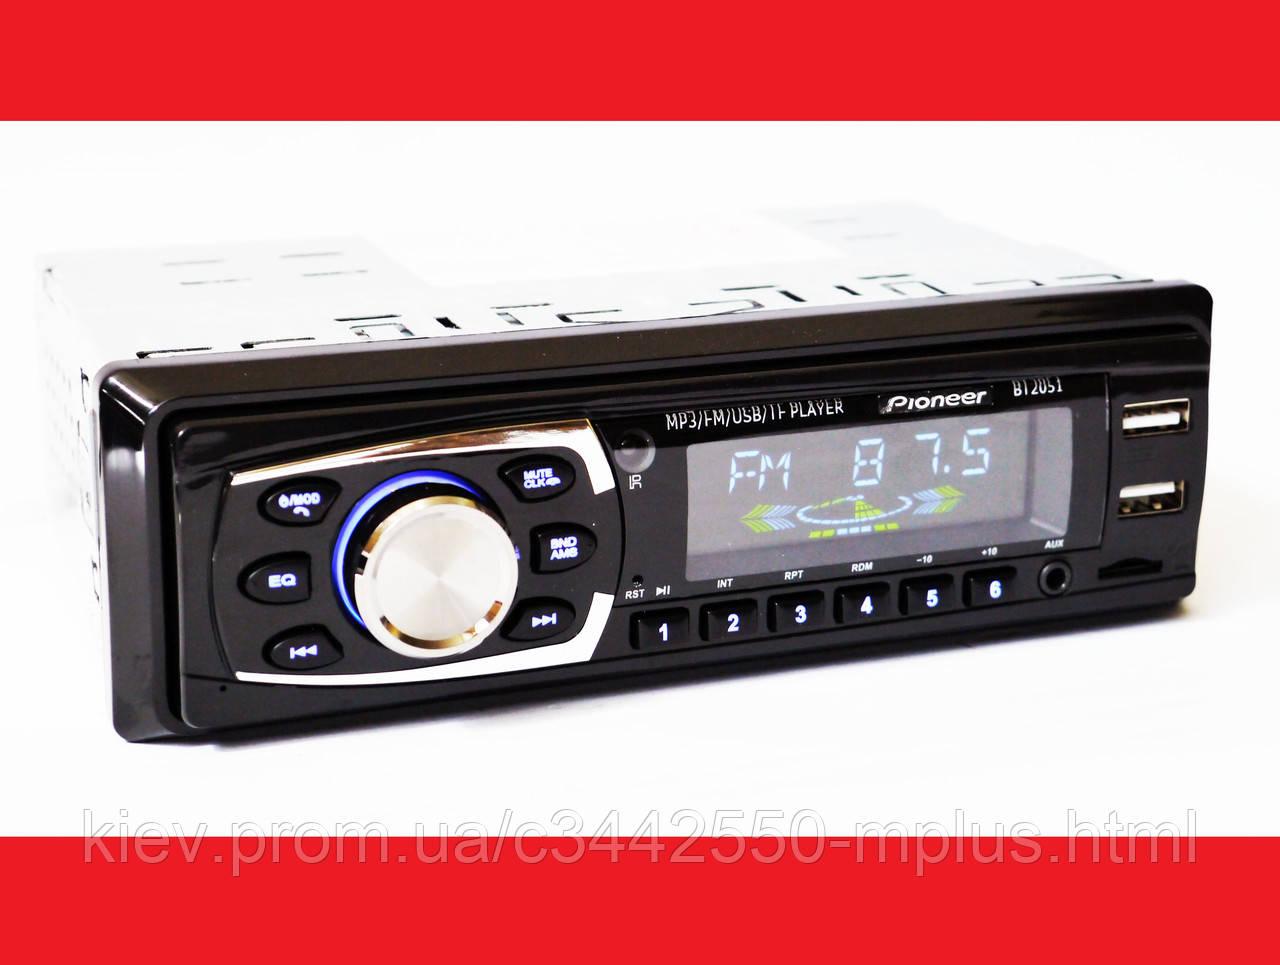 Автомагнитола Pioneer BT2051 Bluetooth ISO FM, USB, SD, AUX